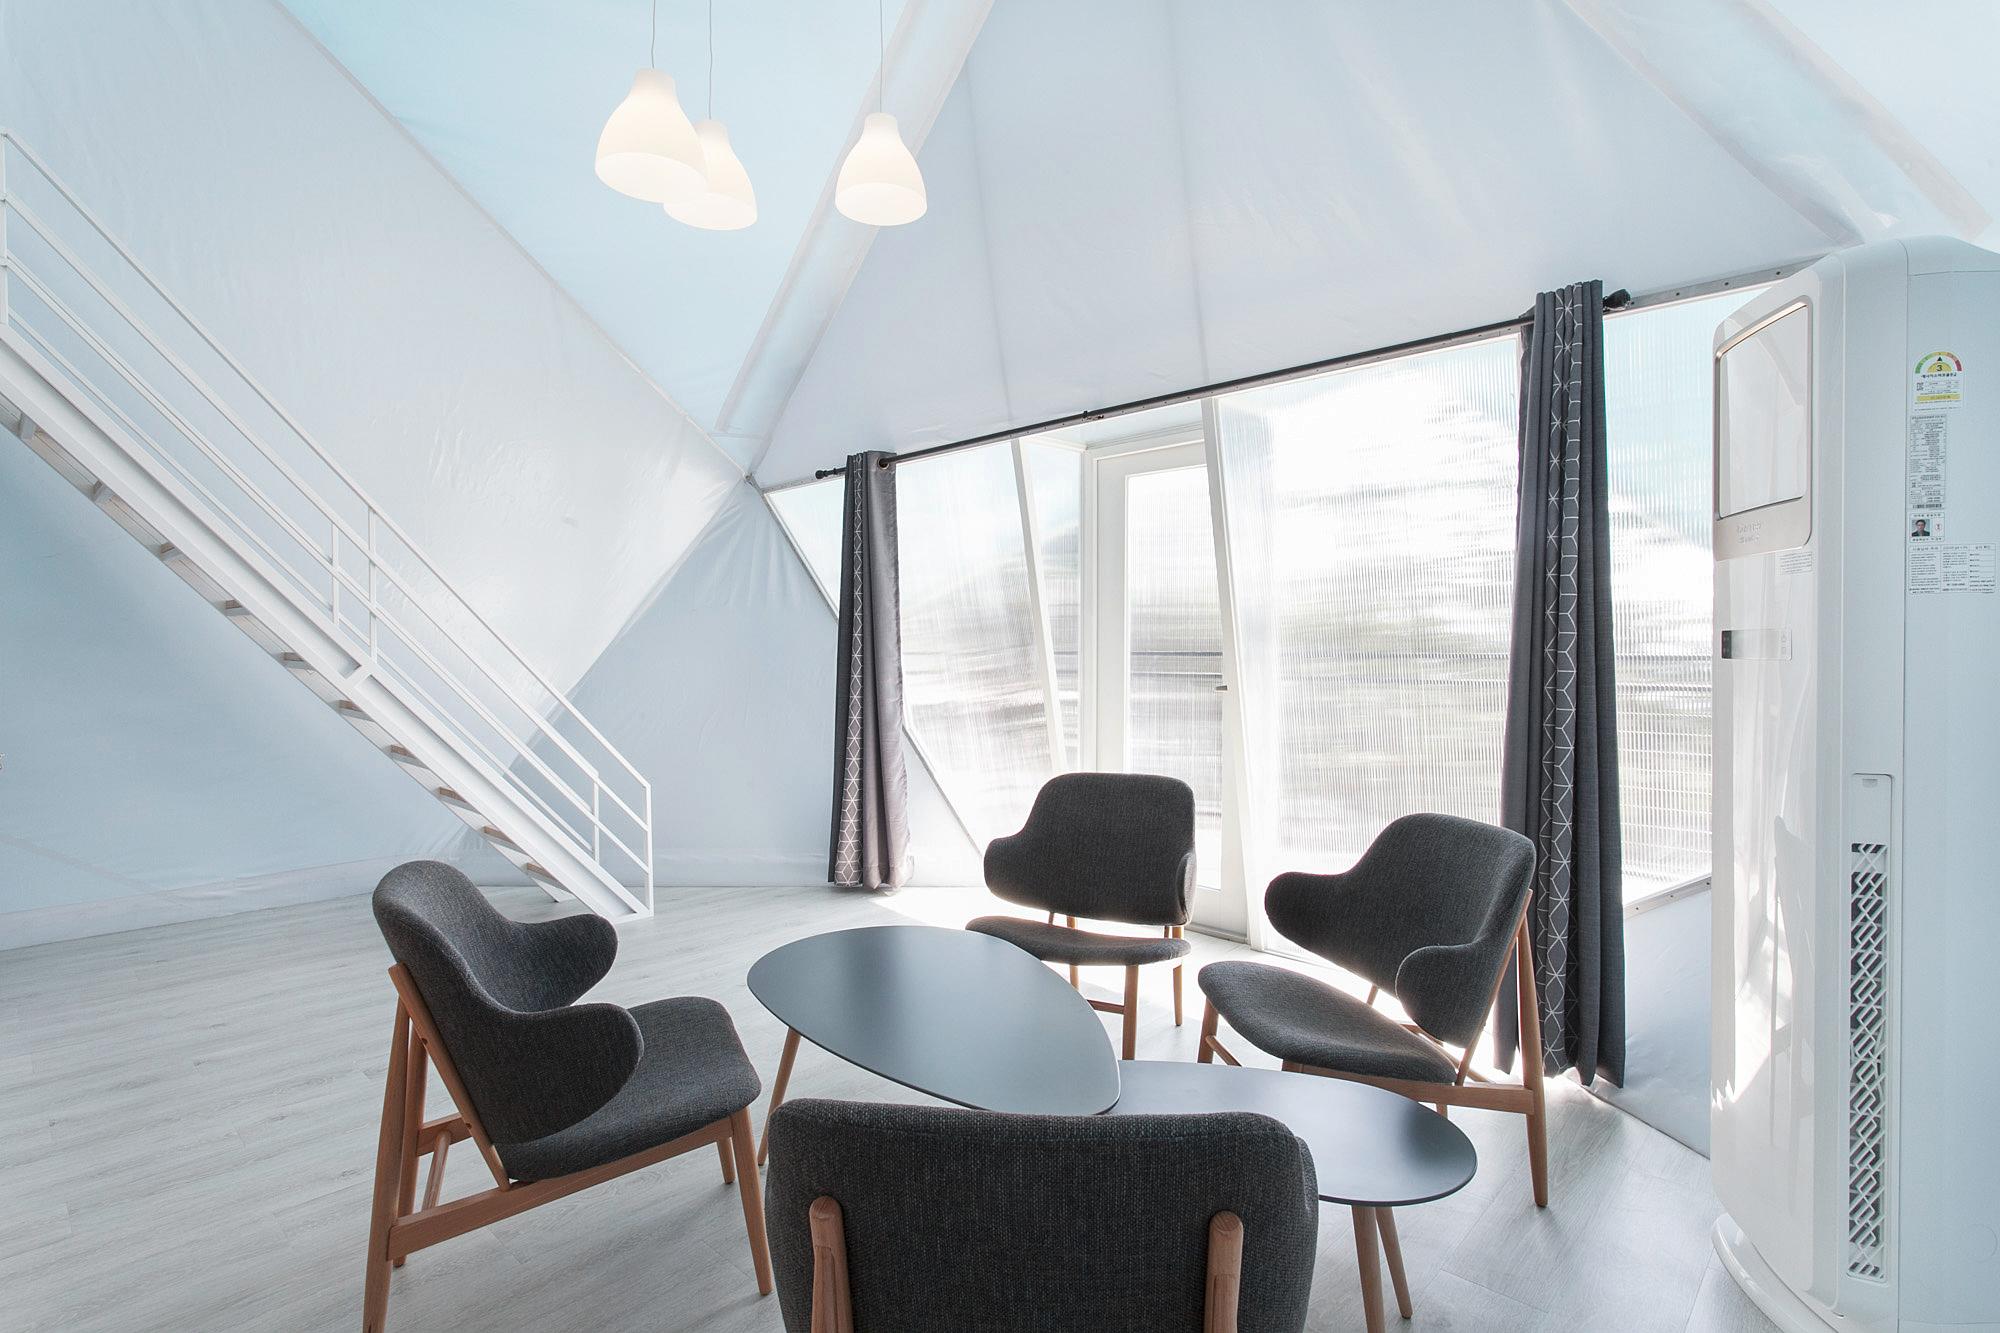 atelierchang_glamping_interior_cutent.jpg